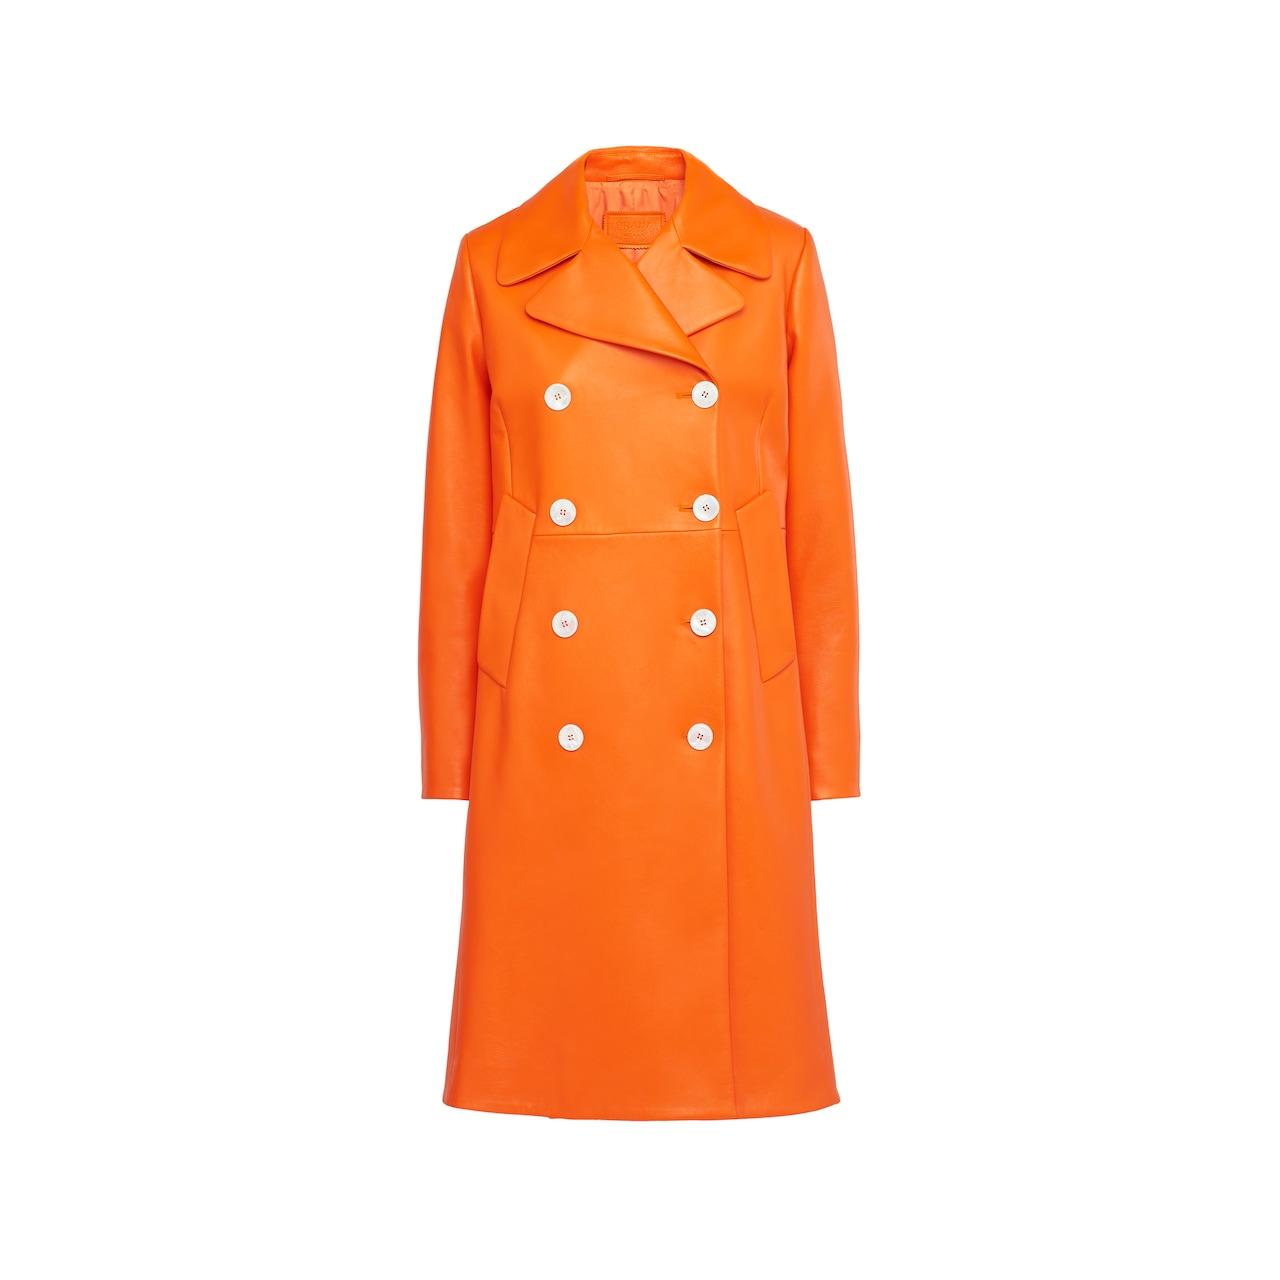 Prada Double-breasted nappa leather coat 1